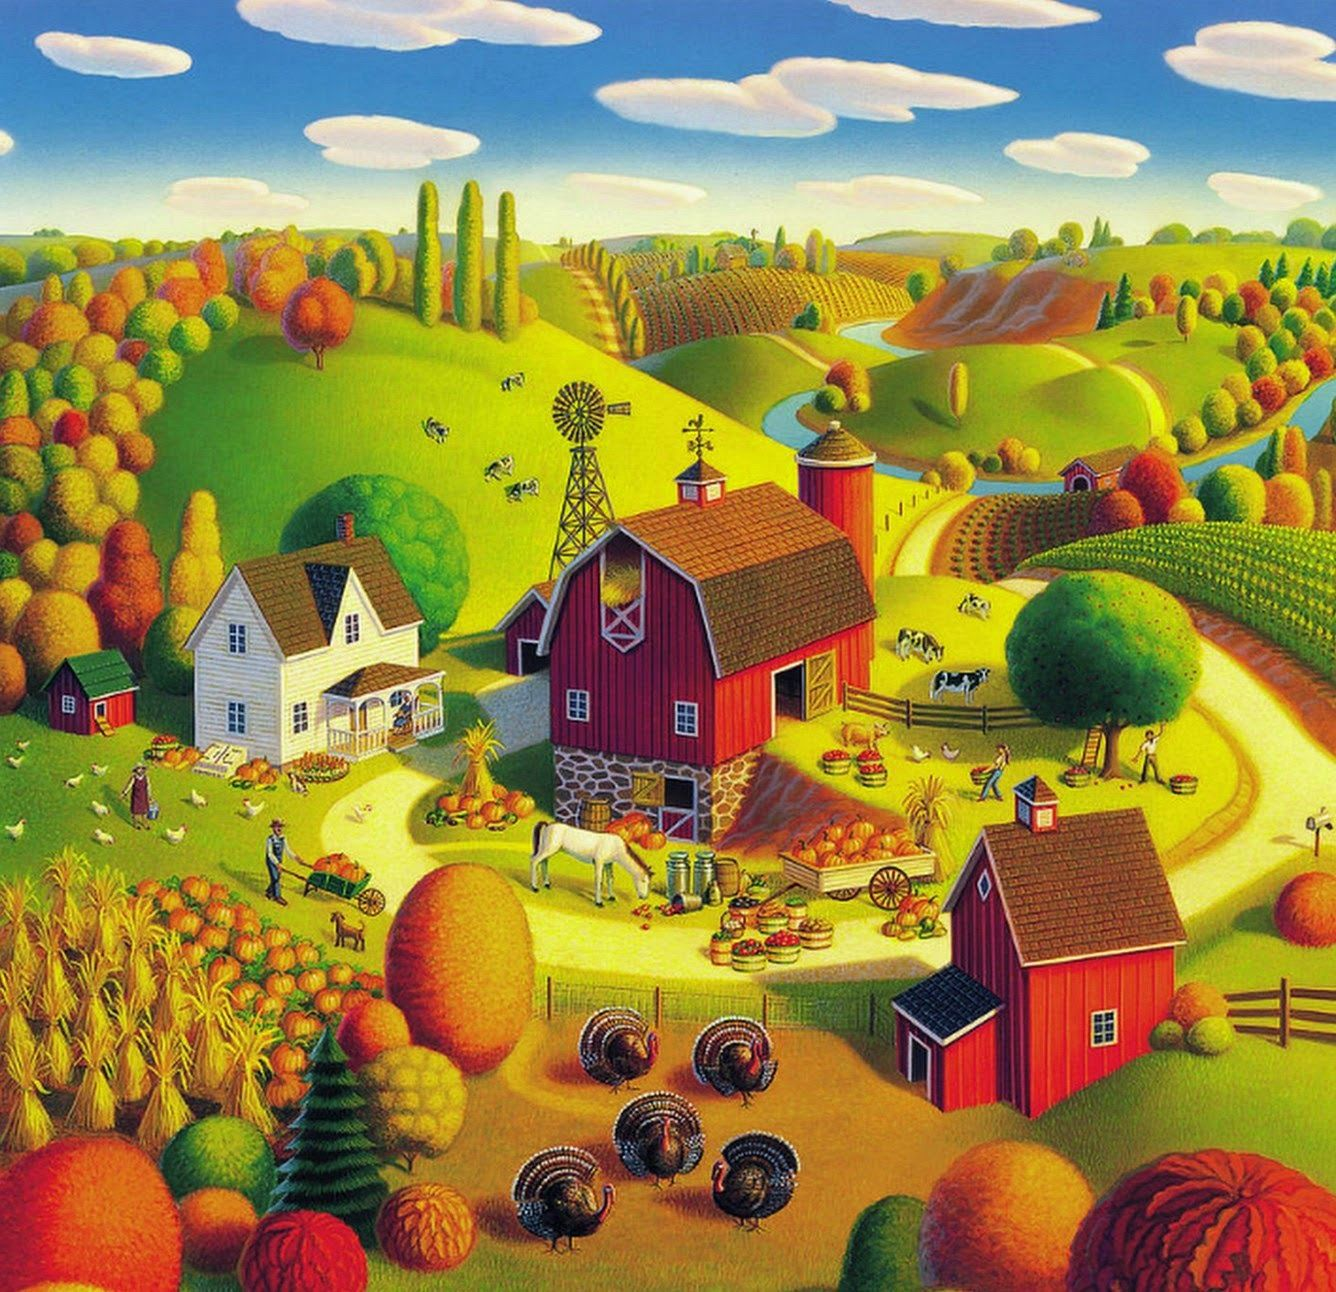 pinturas-naif-famosas | pinturas | Pinterest | Famosos, Pinturas y ...